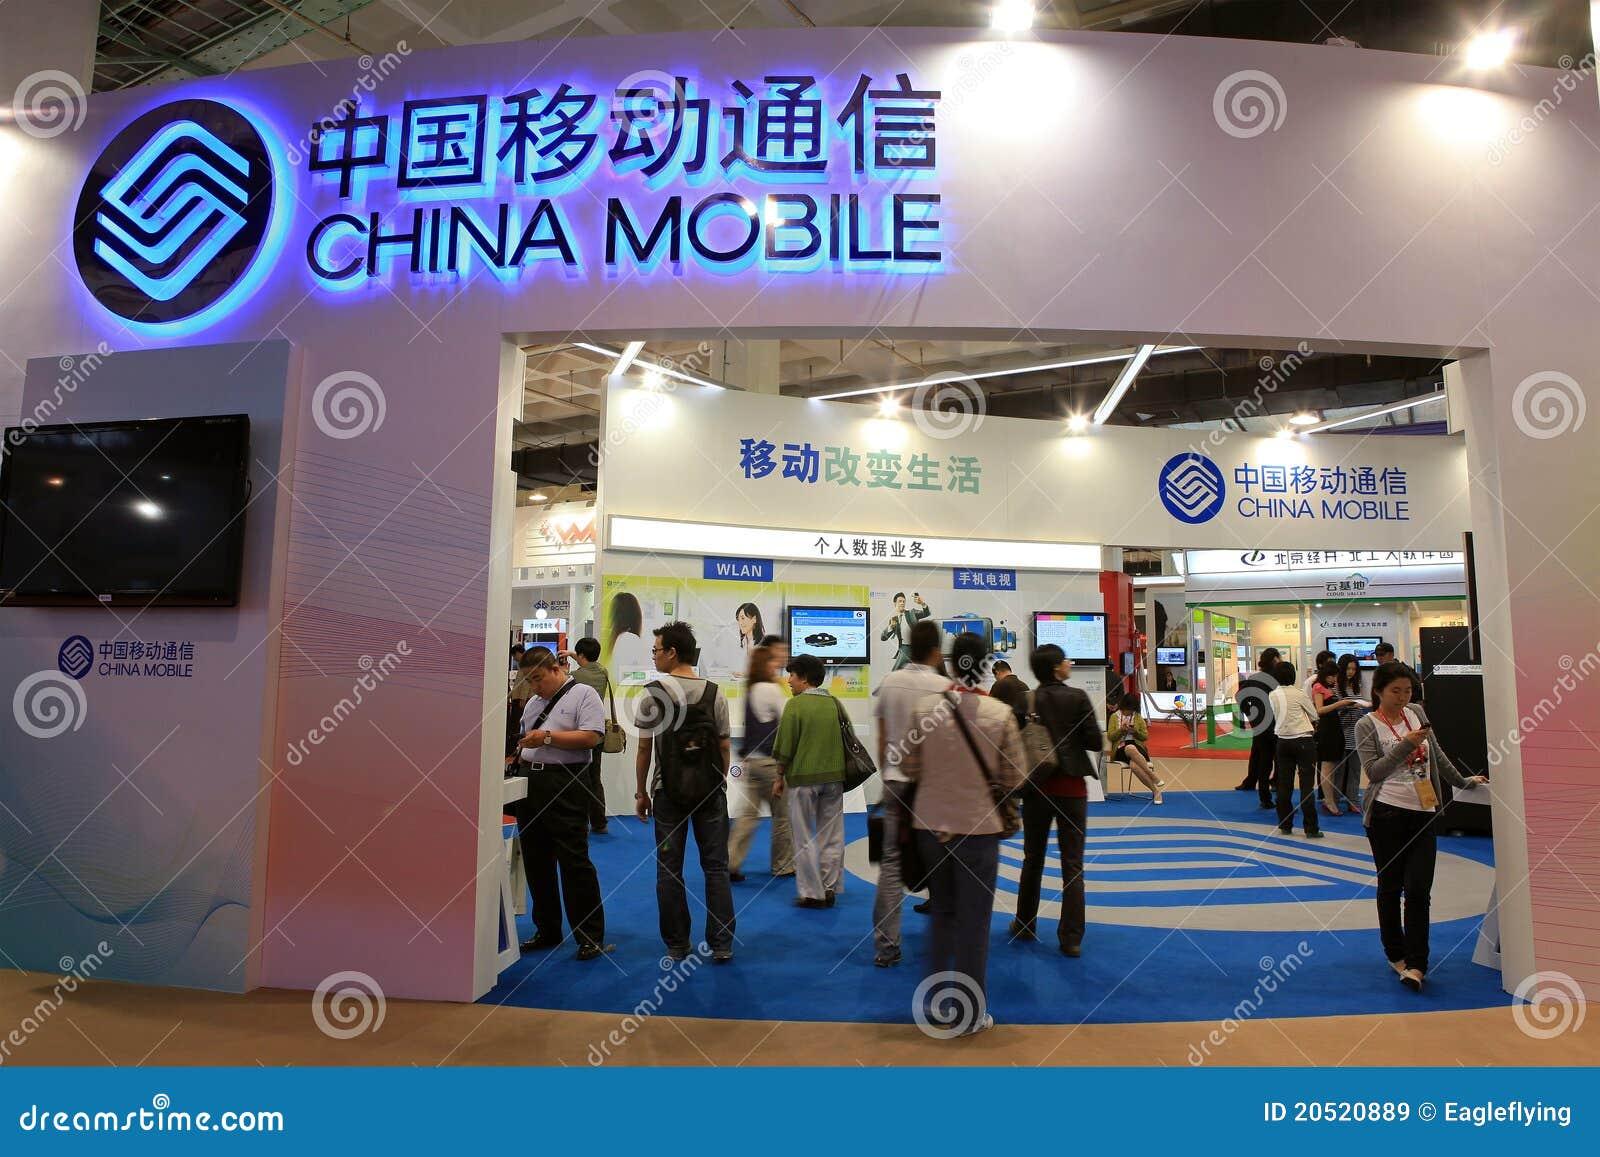 China mobile editorial stock image  Image of environmental - 20520889